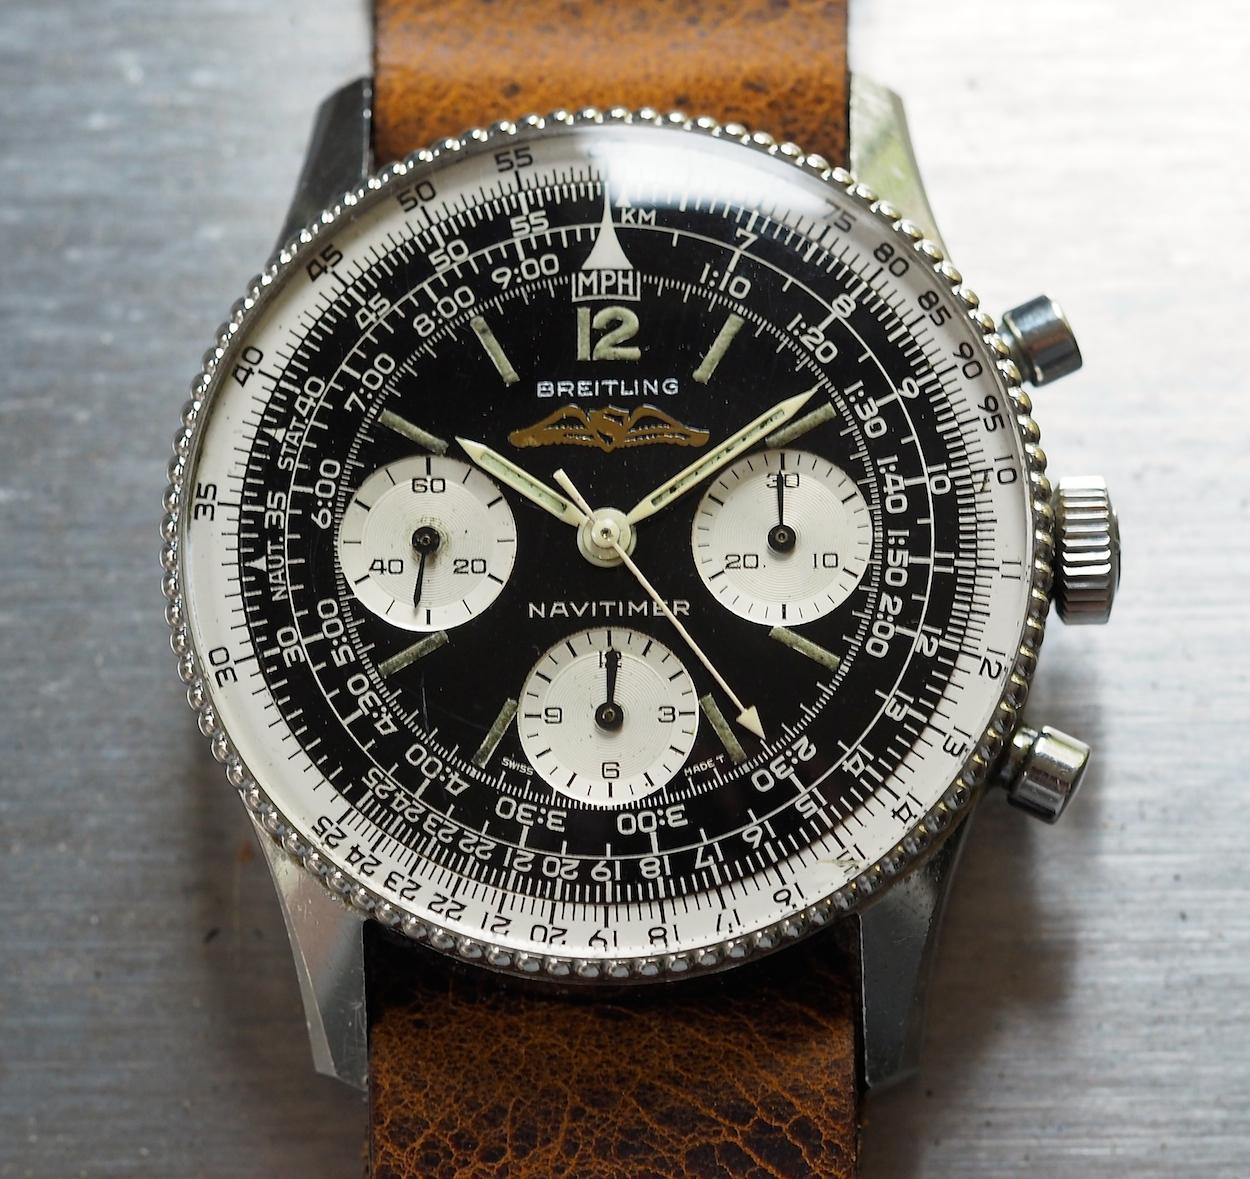 Breitling watches replica - Breitling Navitimer From Watchuseek Forums Breitling Navitimer From Watchuseek Forums